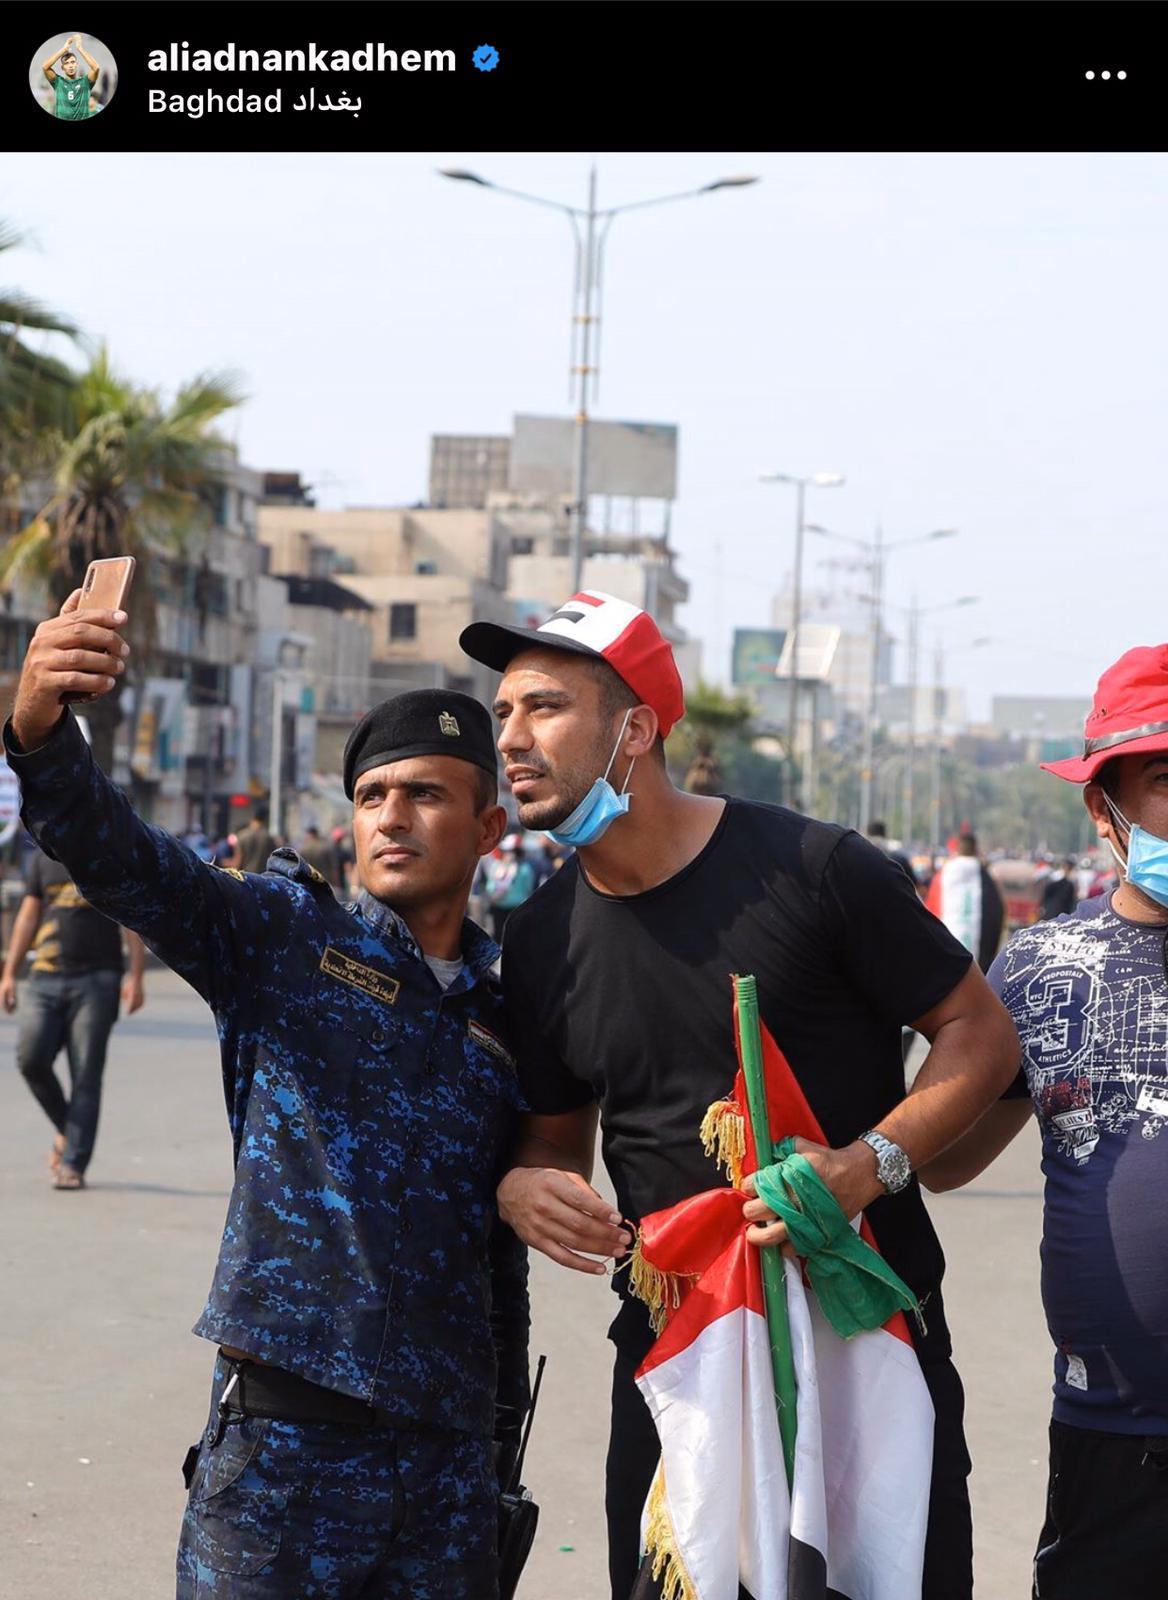 Ali Adnan selfie